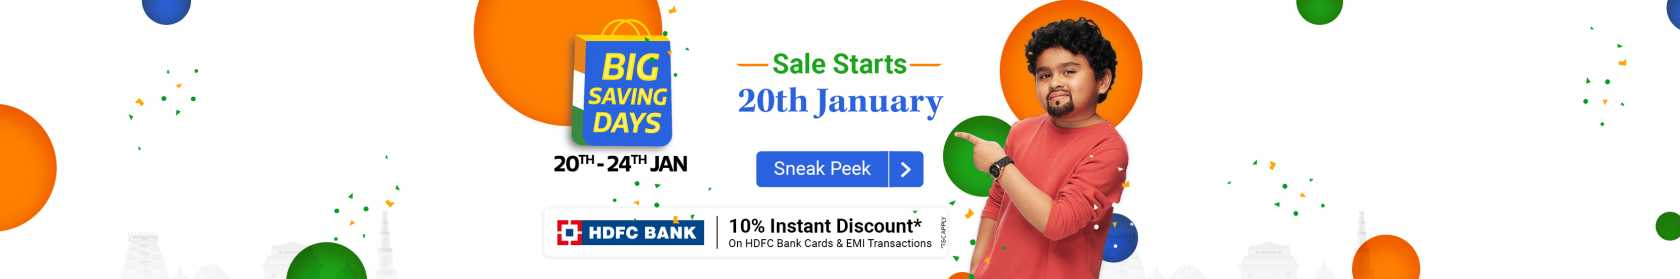 Flipkart - Big Saving Days 20th till 24th Jan 2021